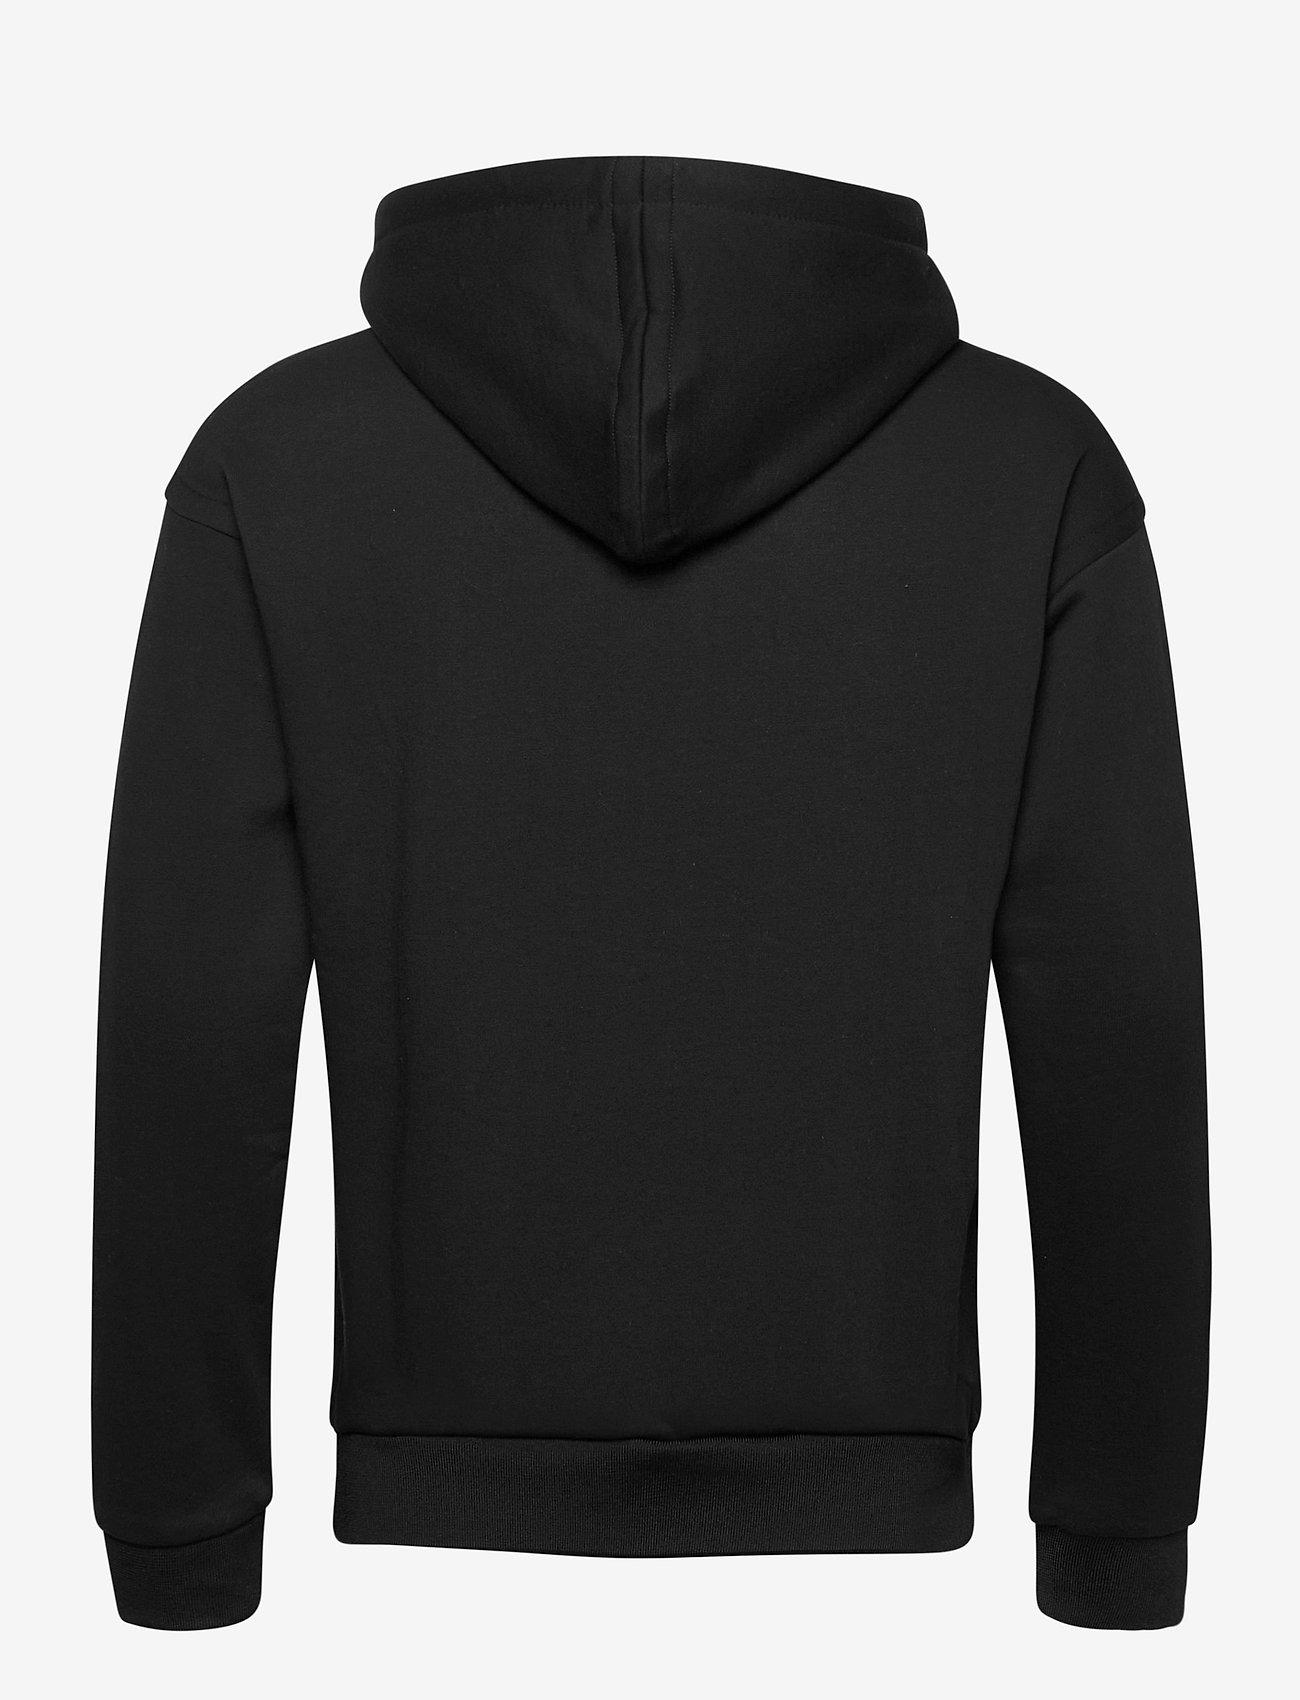 Scotch & Soda - Scotch & Soda hooded sweat - hoodies - black - 1